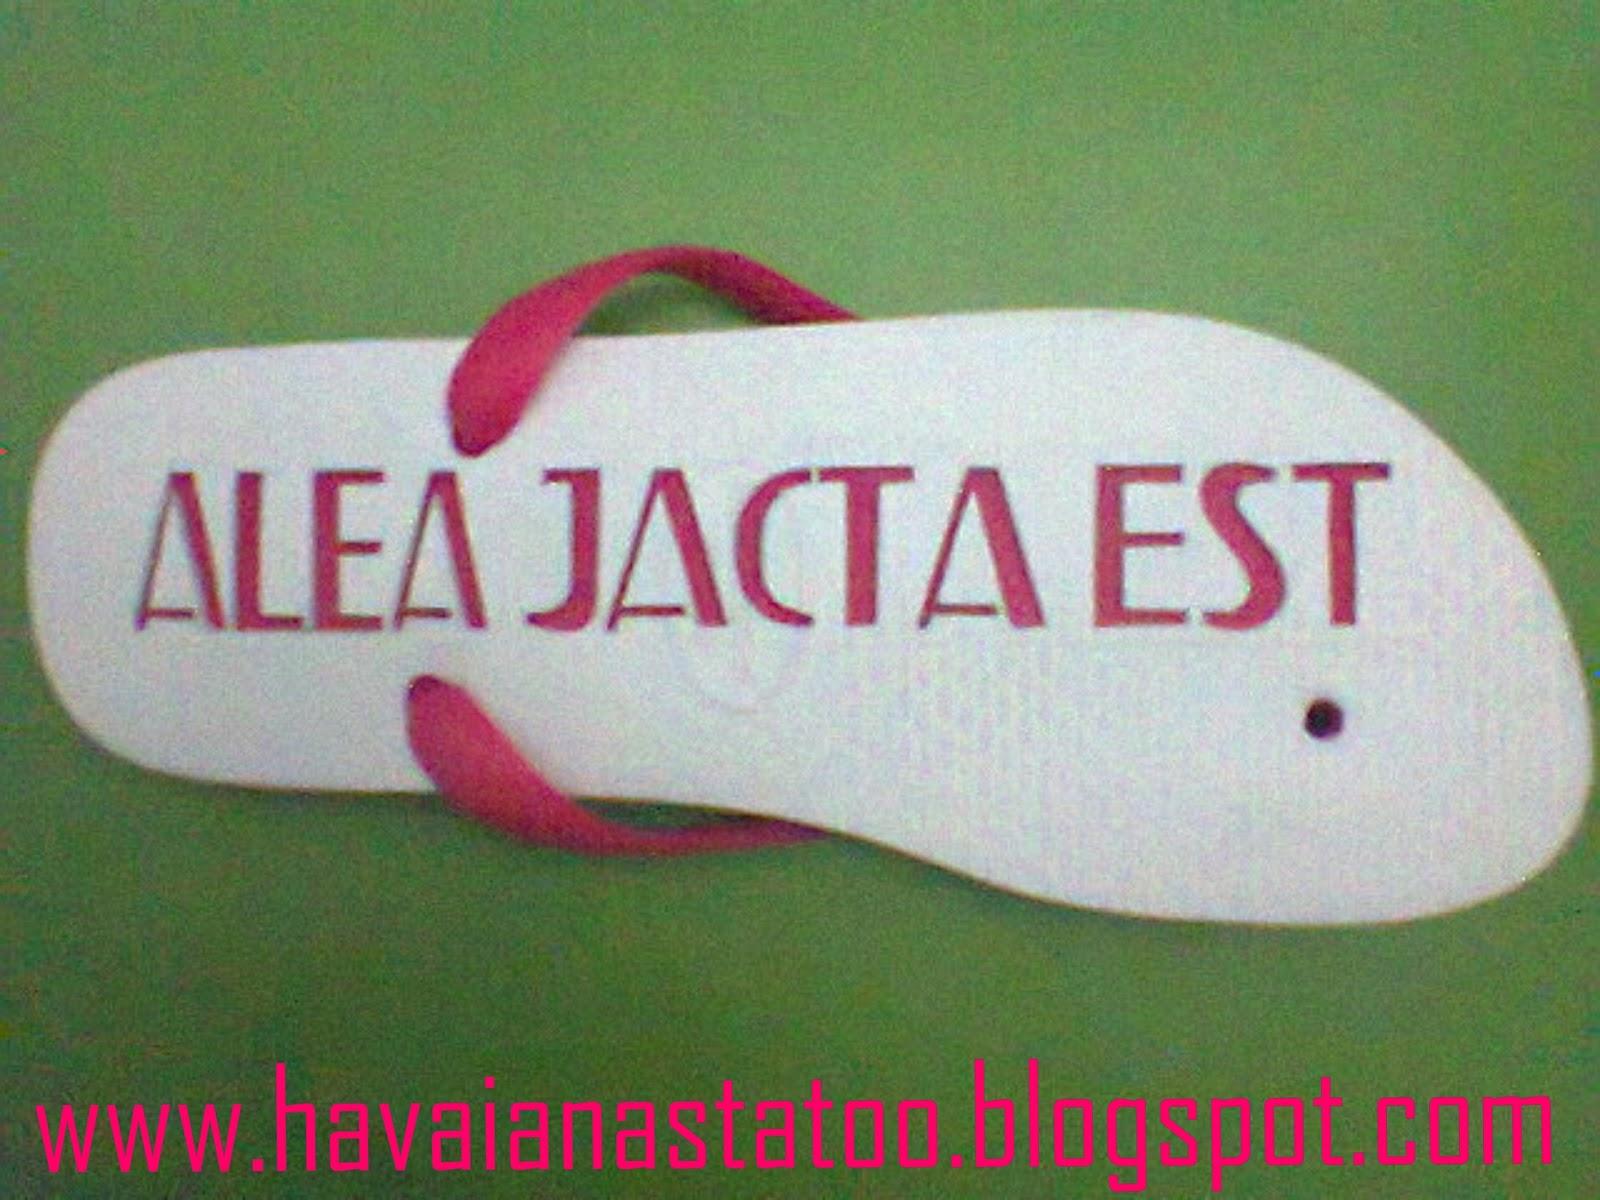 http://1.bp.blogspot.com/-Ar8ZxbtoWRE/UJkG2uTVrYI/AAAAAAAAAfE/FPvbfcKgeLw/s1600/alea.jpg